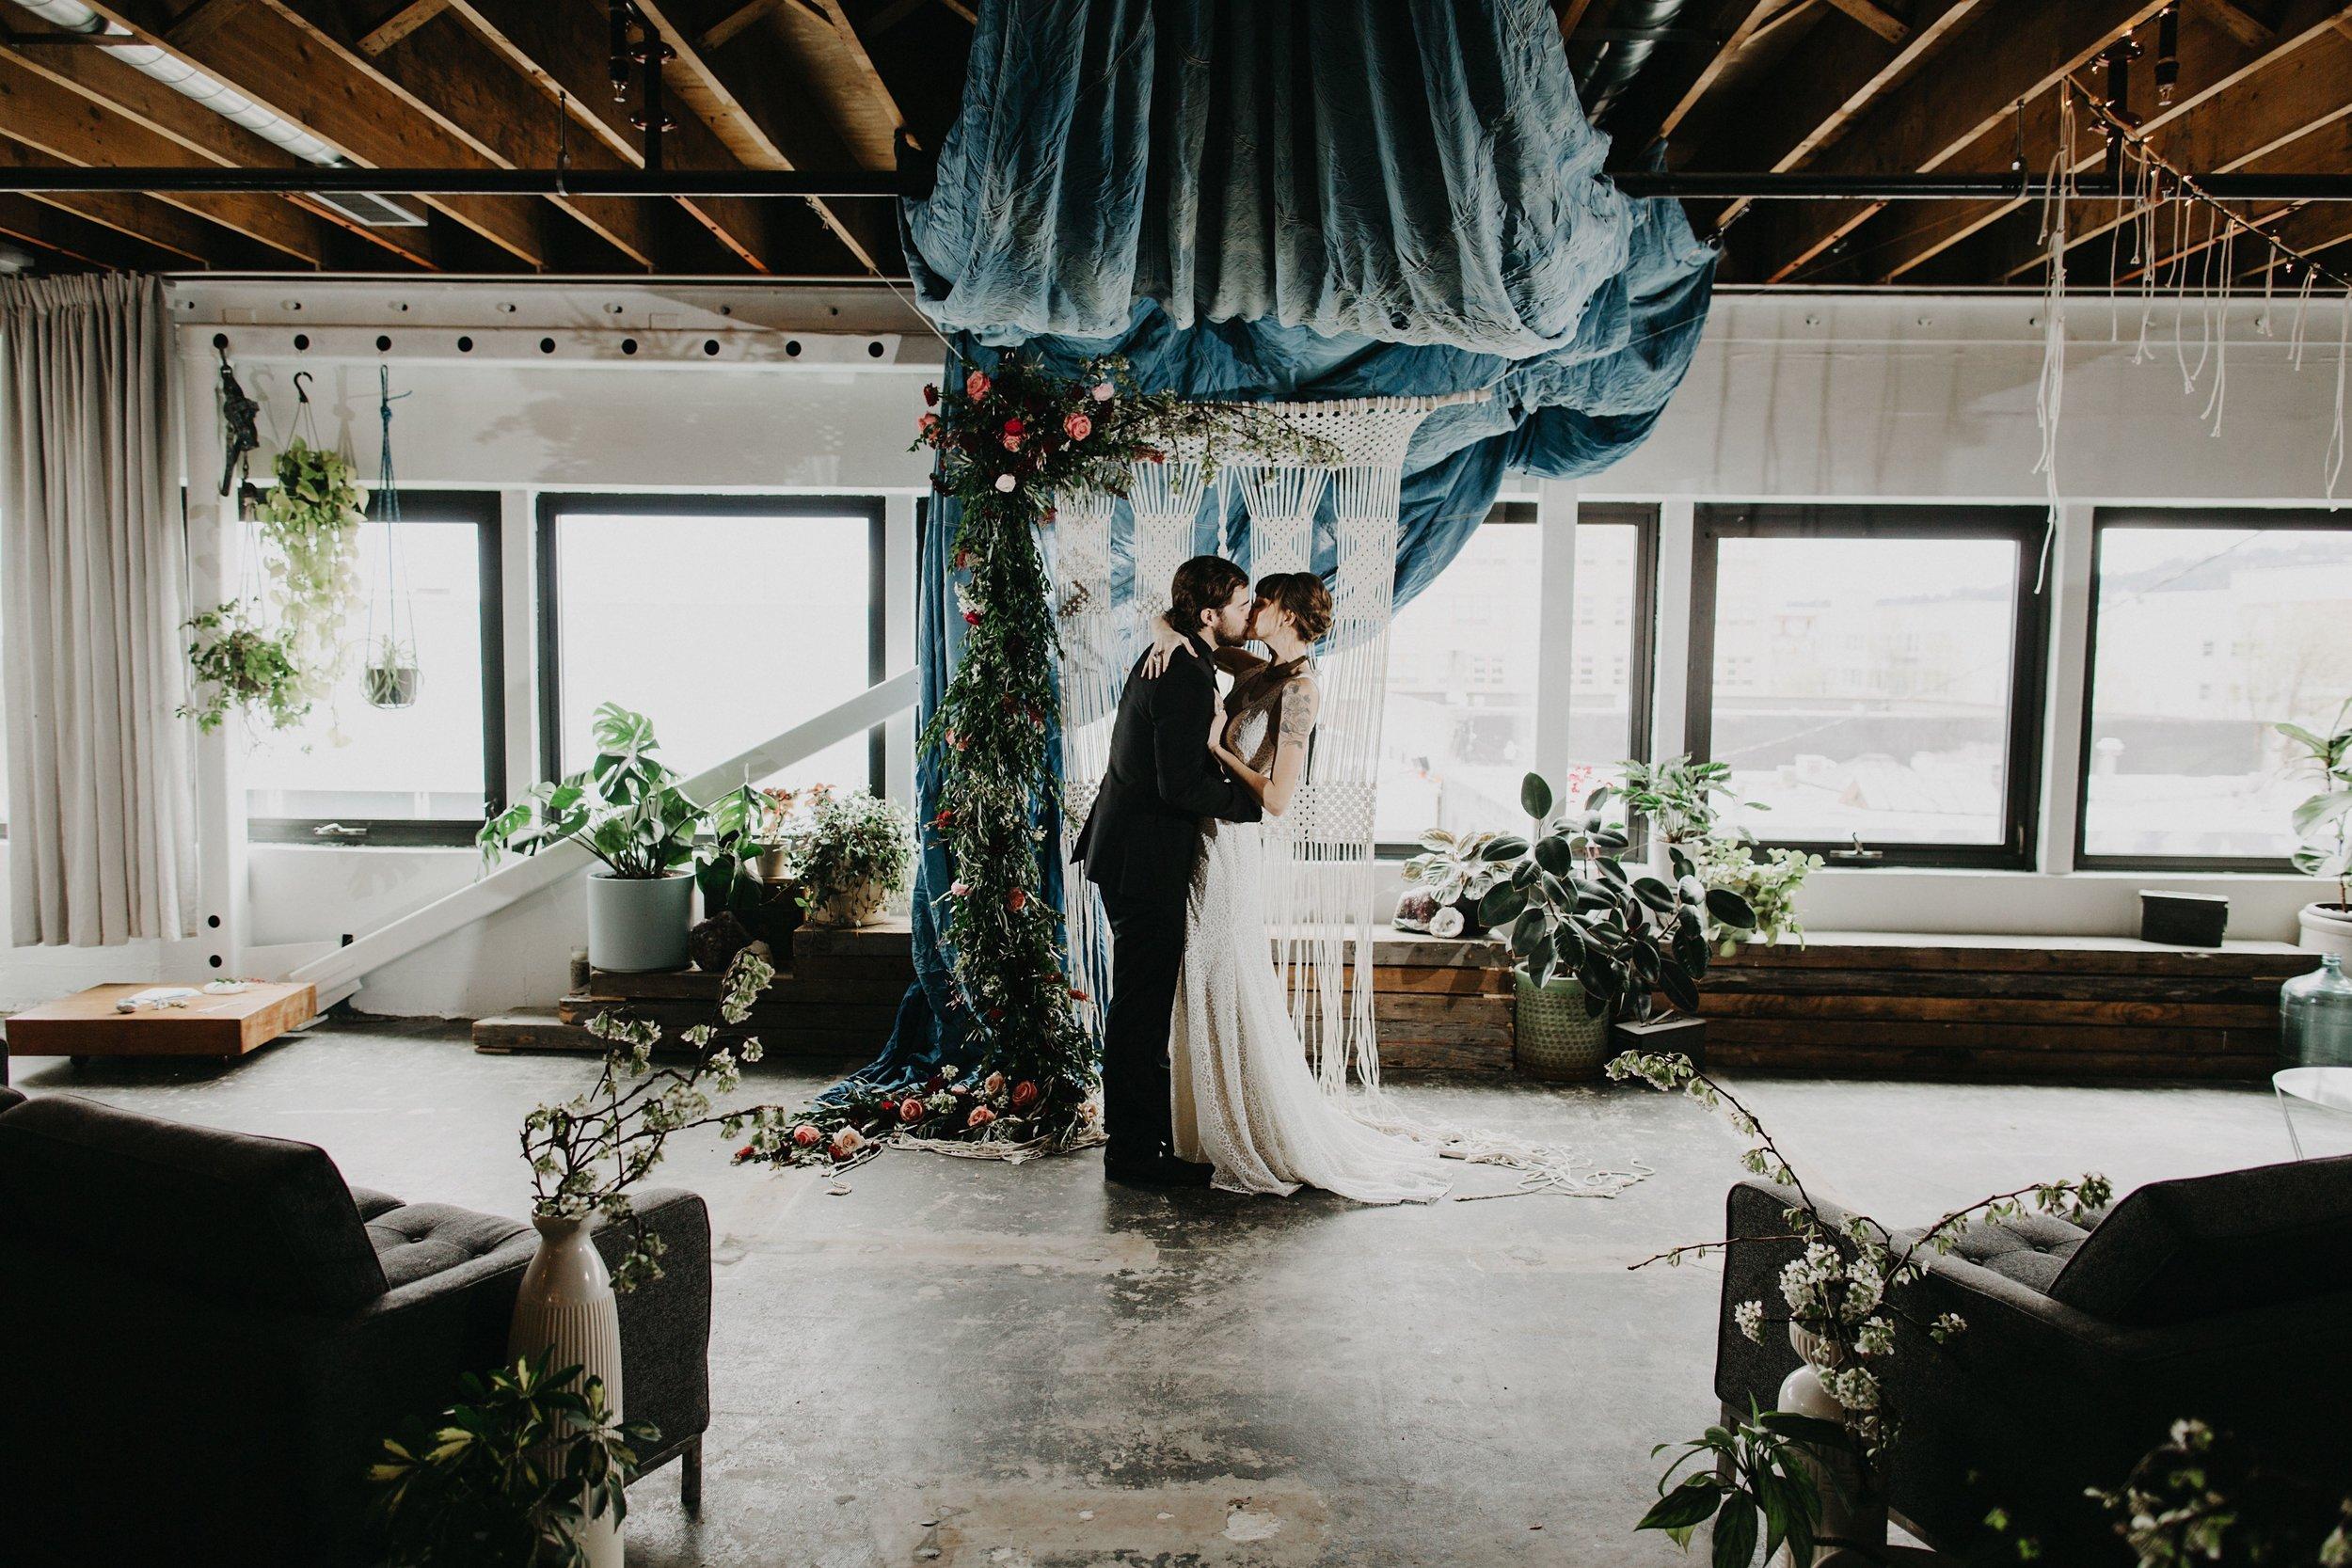 portland-wedding-venue-union-pine37.jpg